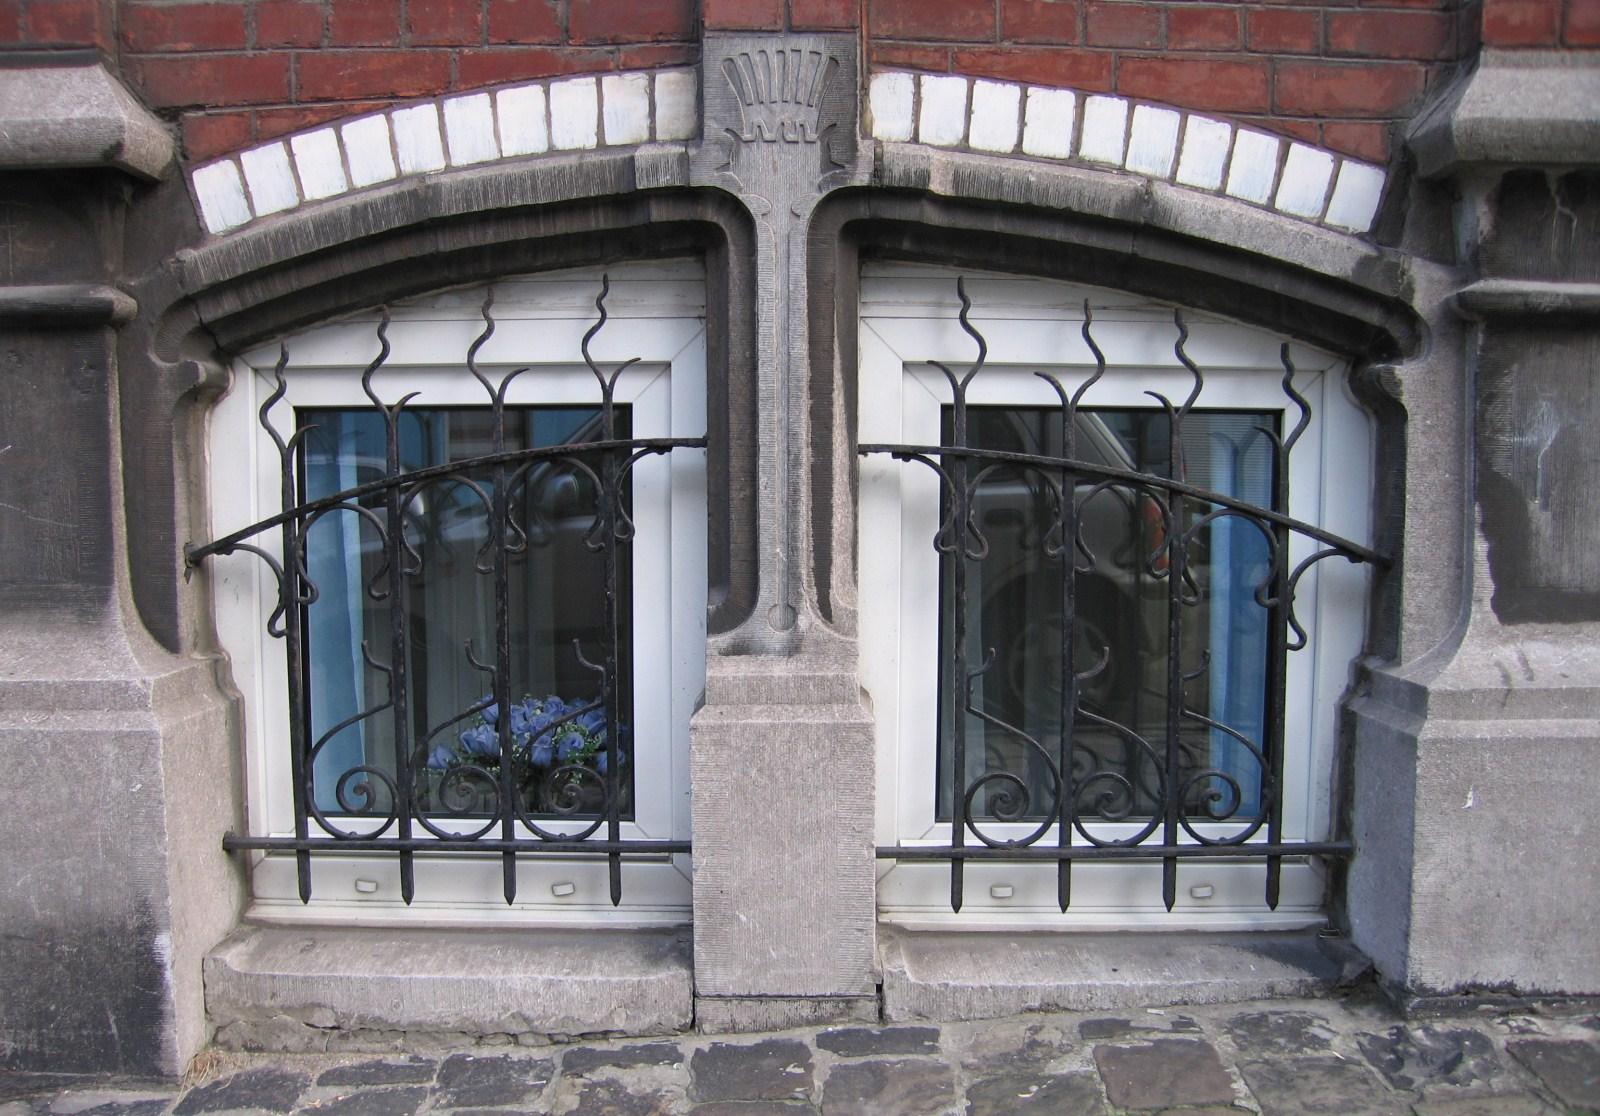 bruxelles extension est rue john waterloo wilson 42 aulbur antoine. Black Bedroom Furniture Sets. Home Design Ideas